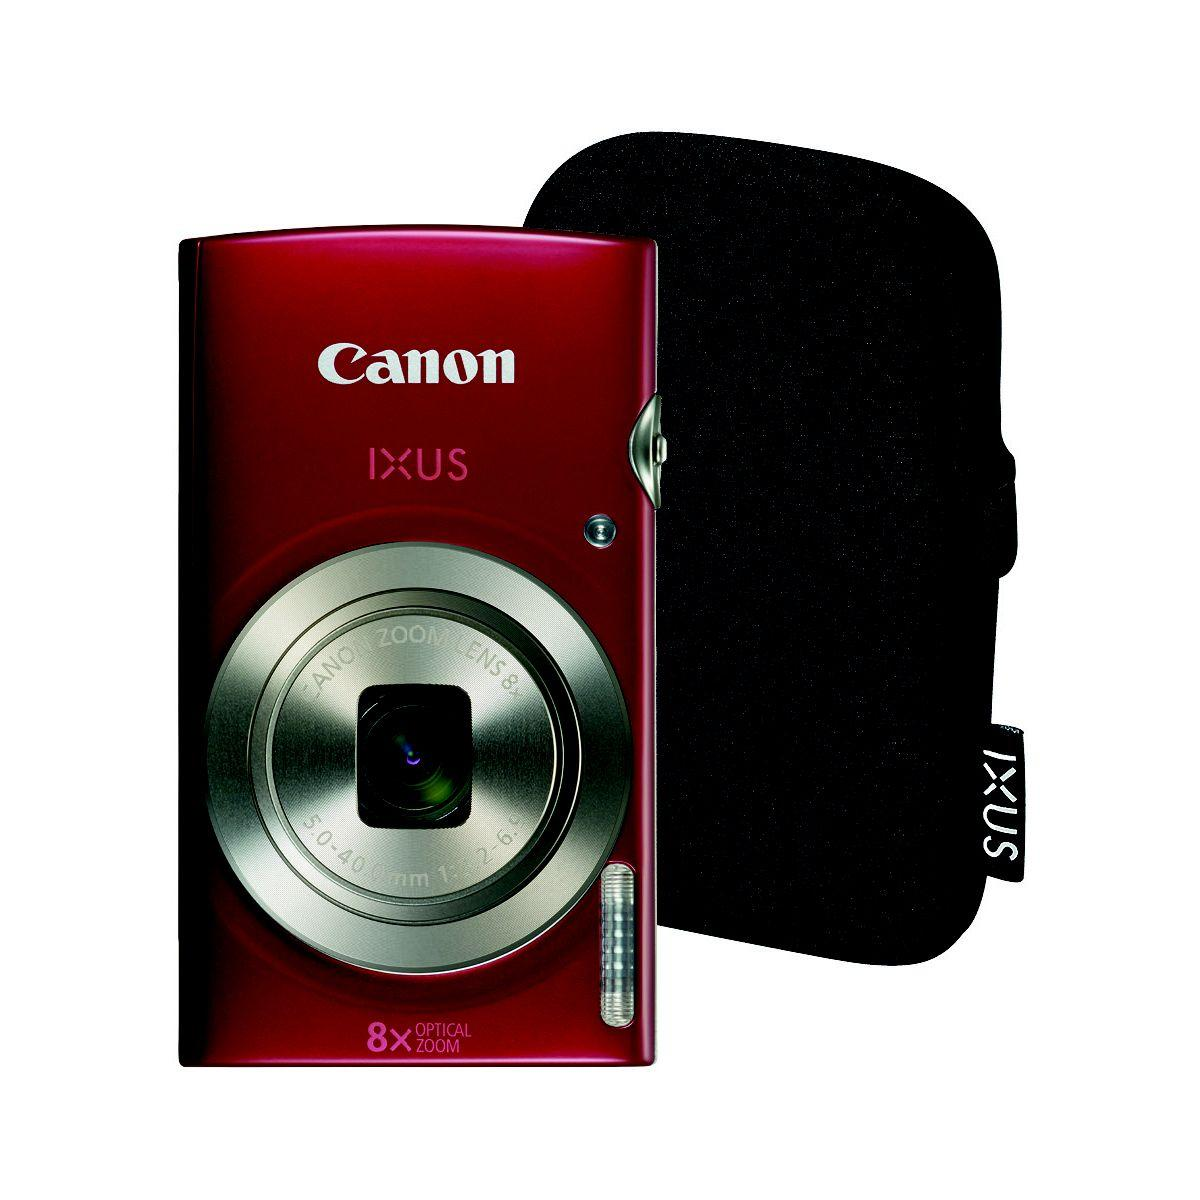 Appareil photo compact canon ixus 185 rouge + etui (photo)